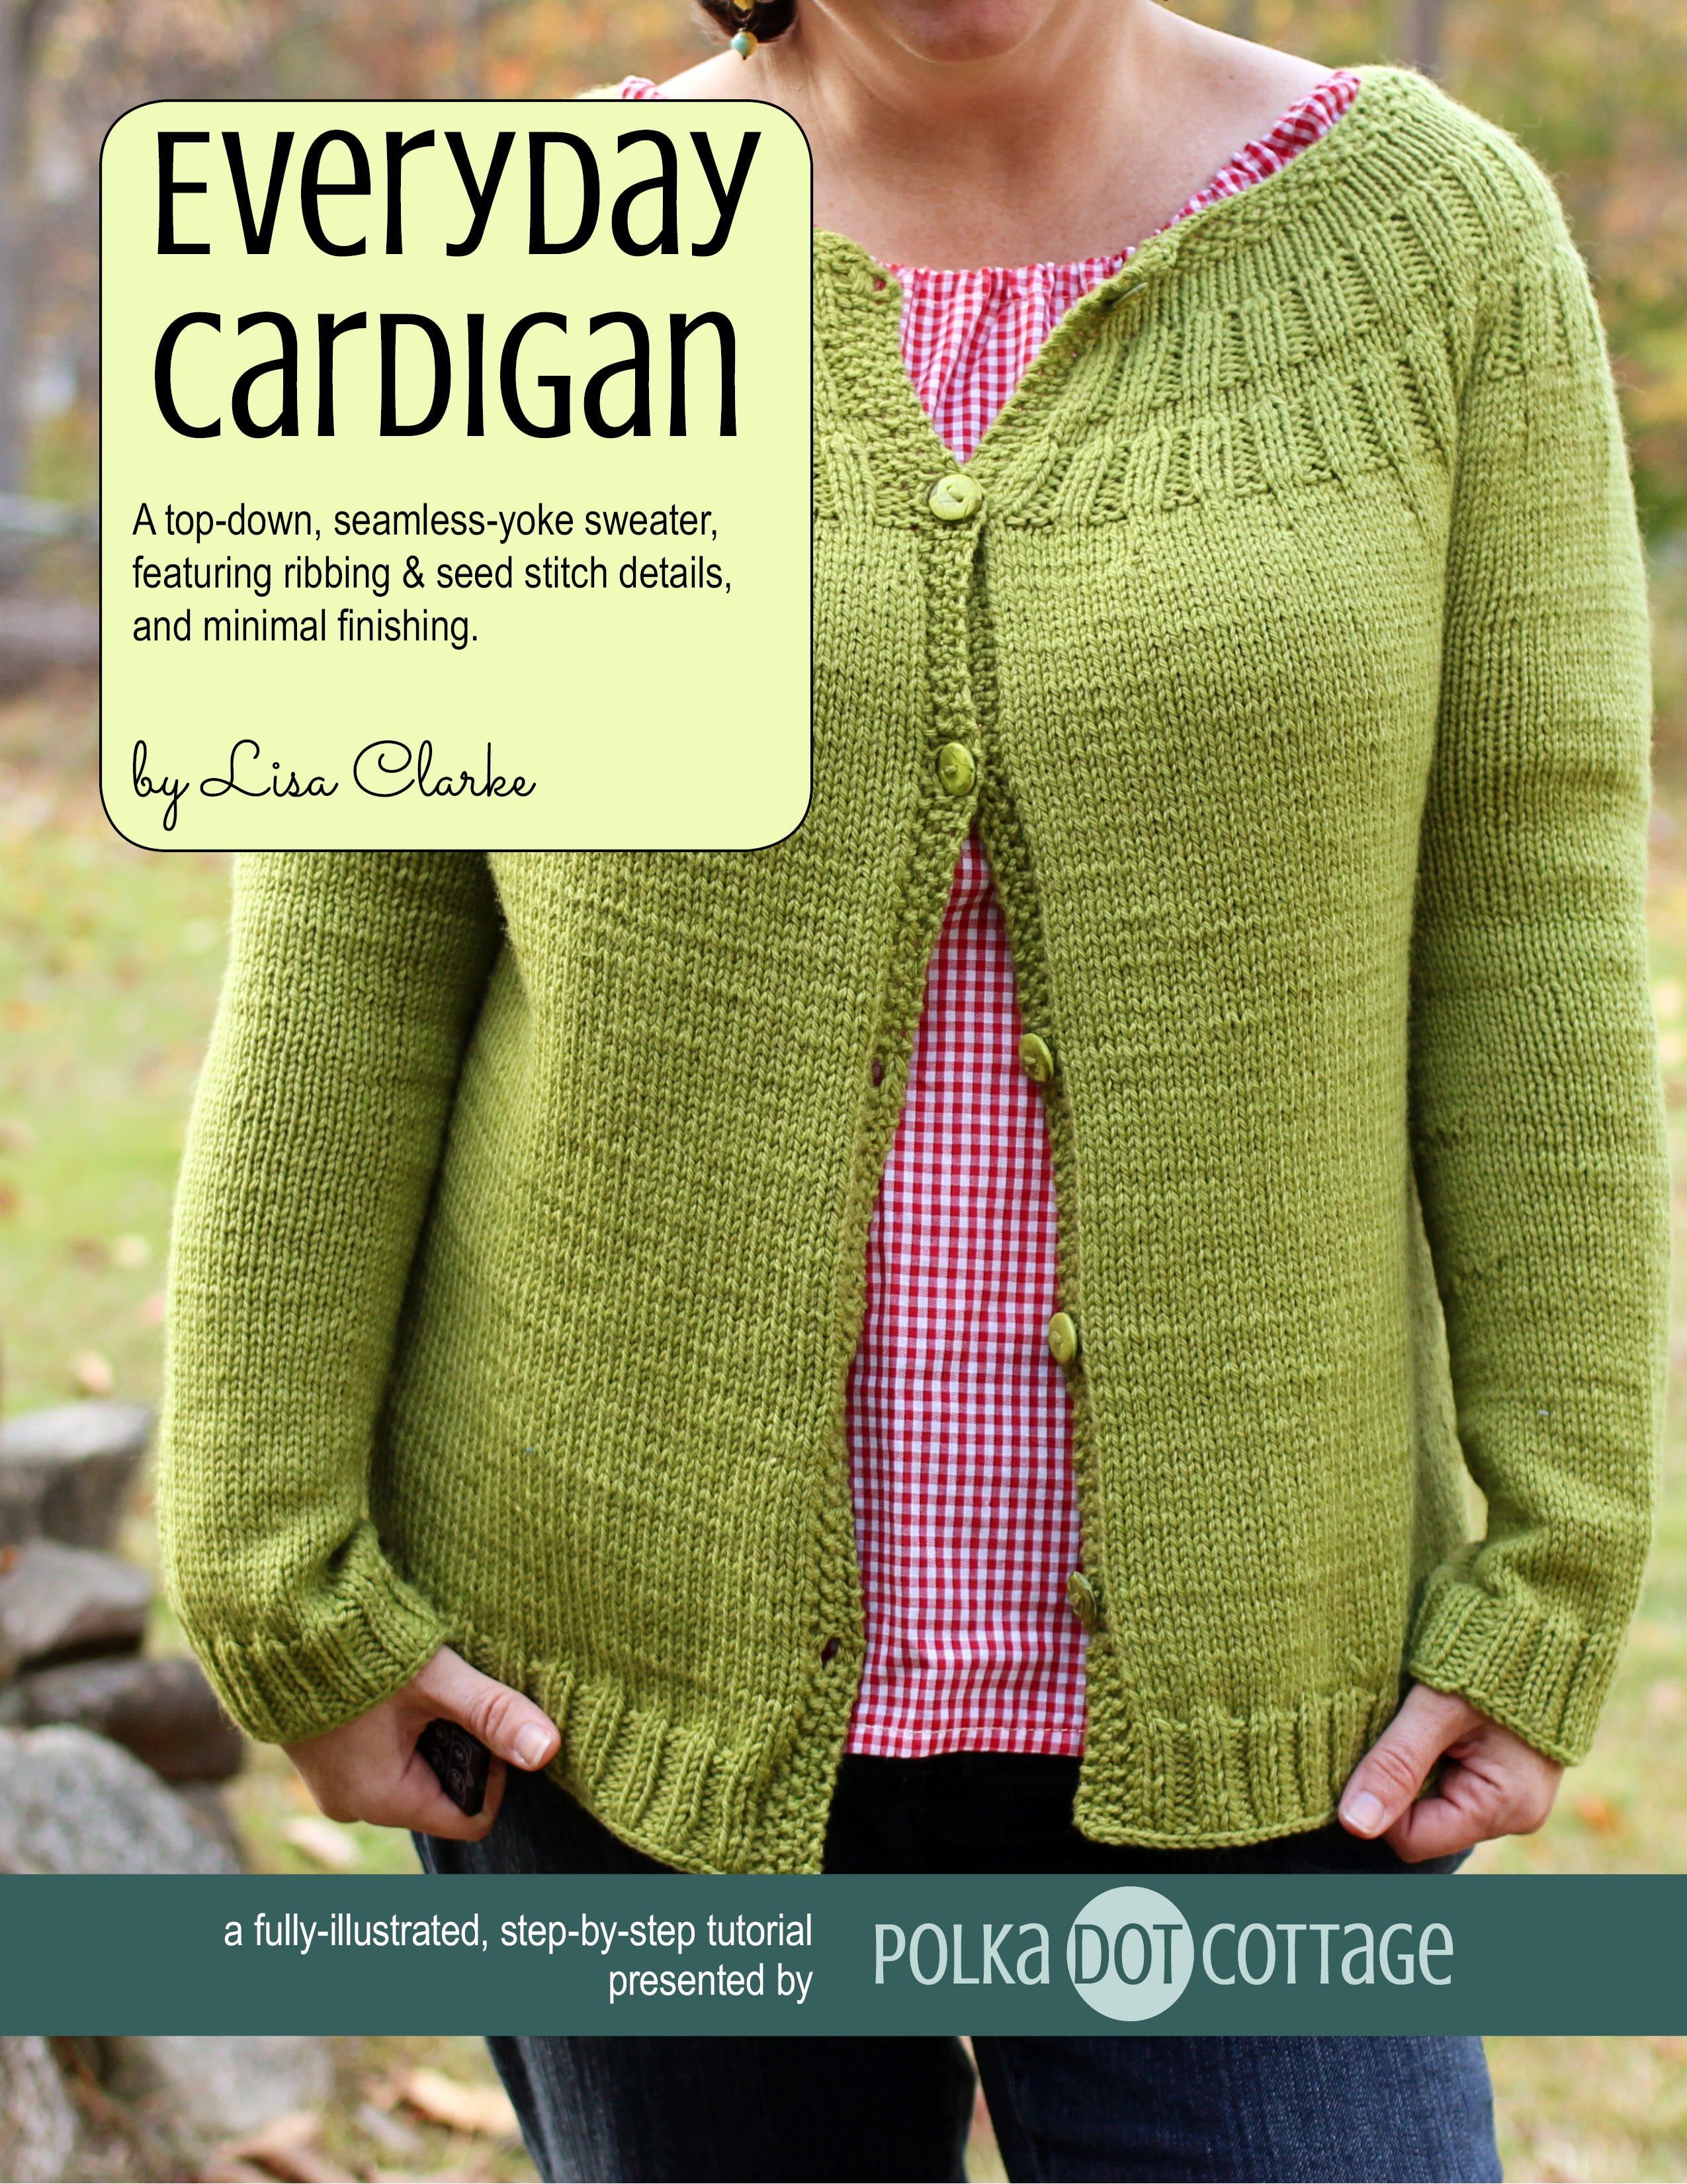 Everyday Cardigan, knitting pattern at Polka Dot Cottage